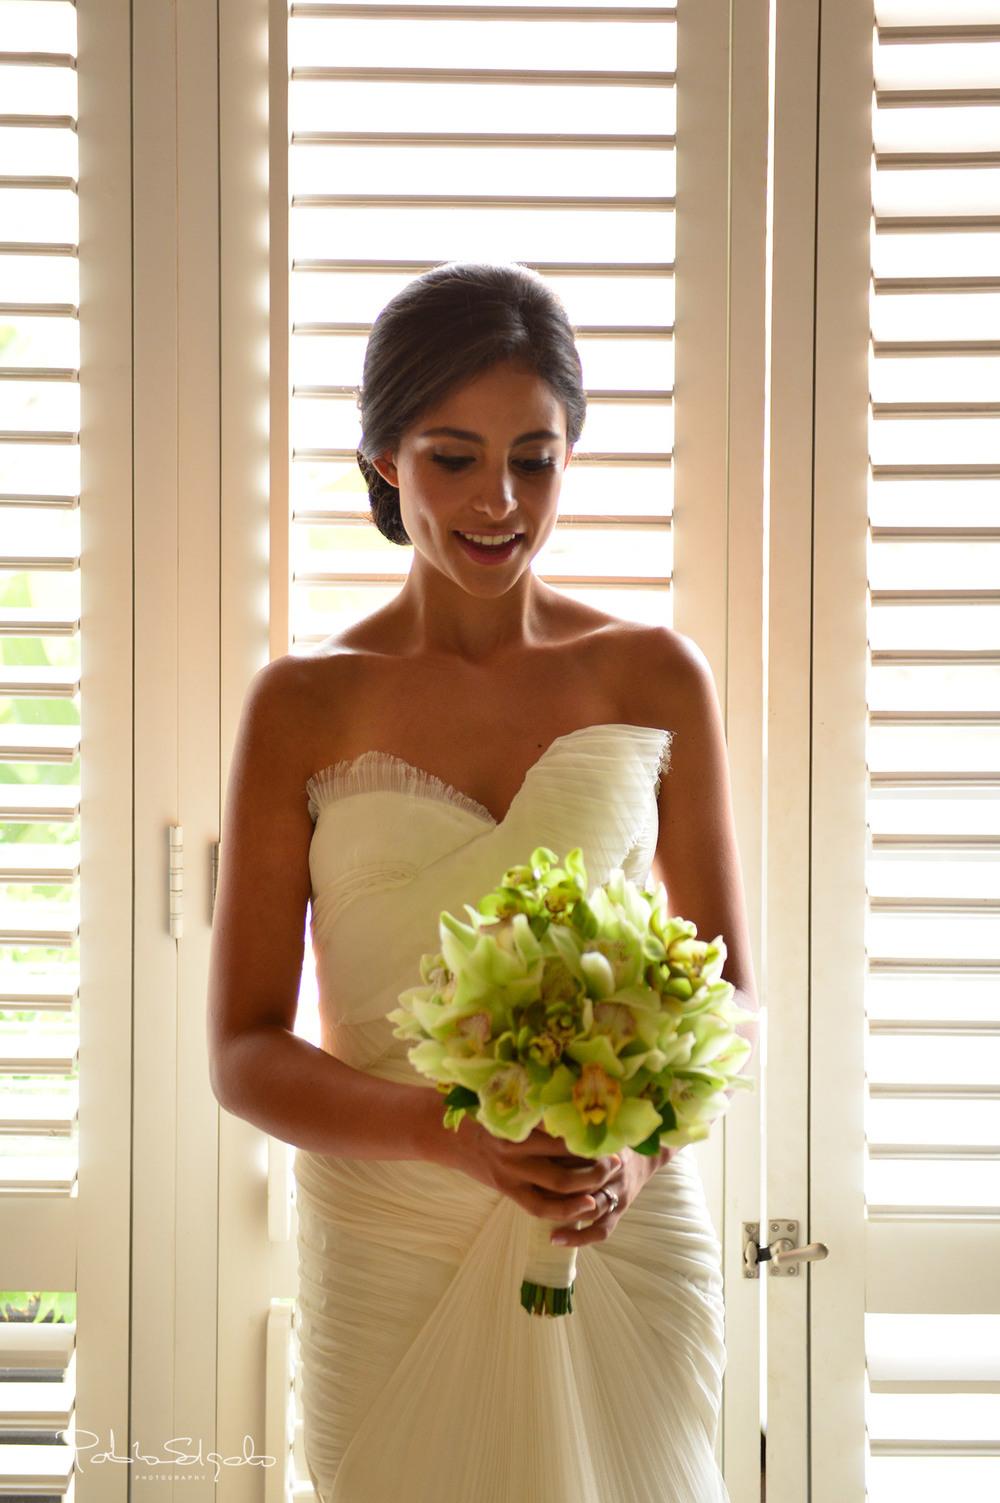 boda-en-cartagena_pablosalgado_PSB1495ed.jpg